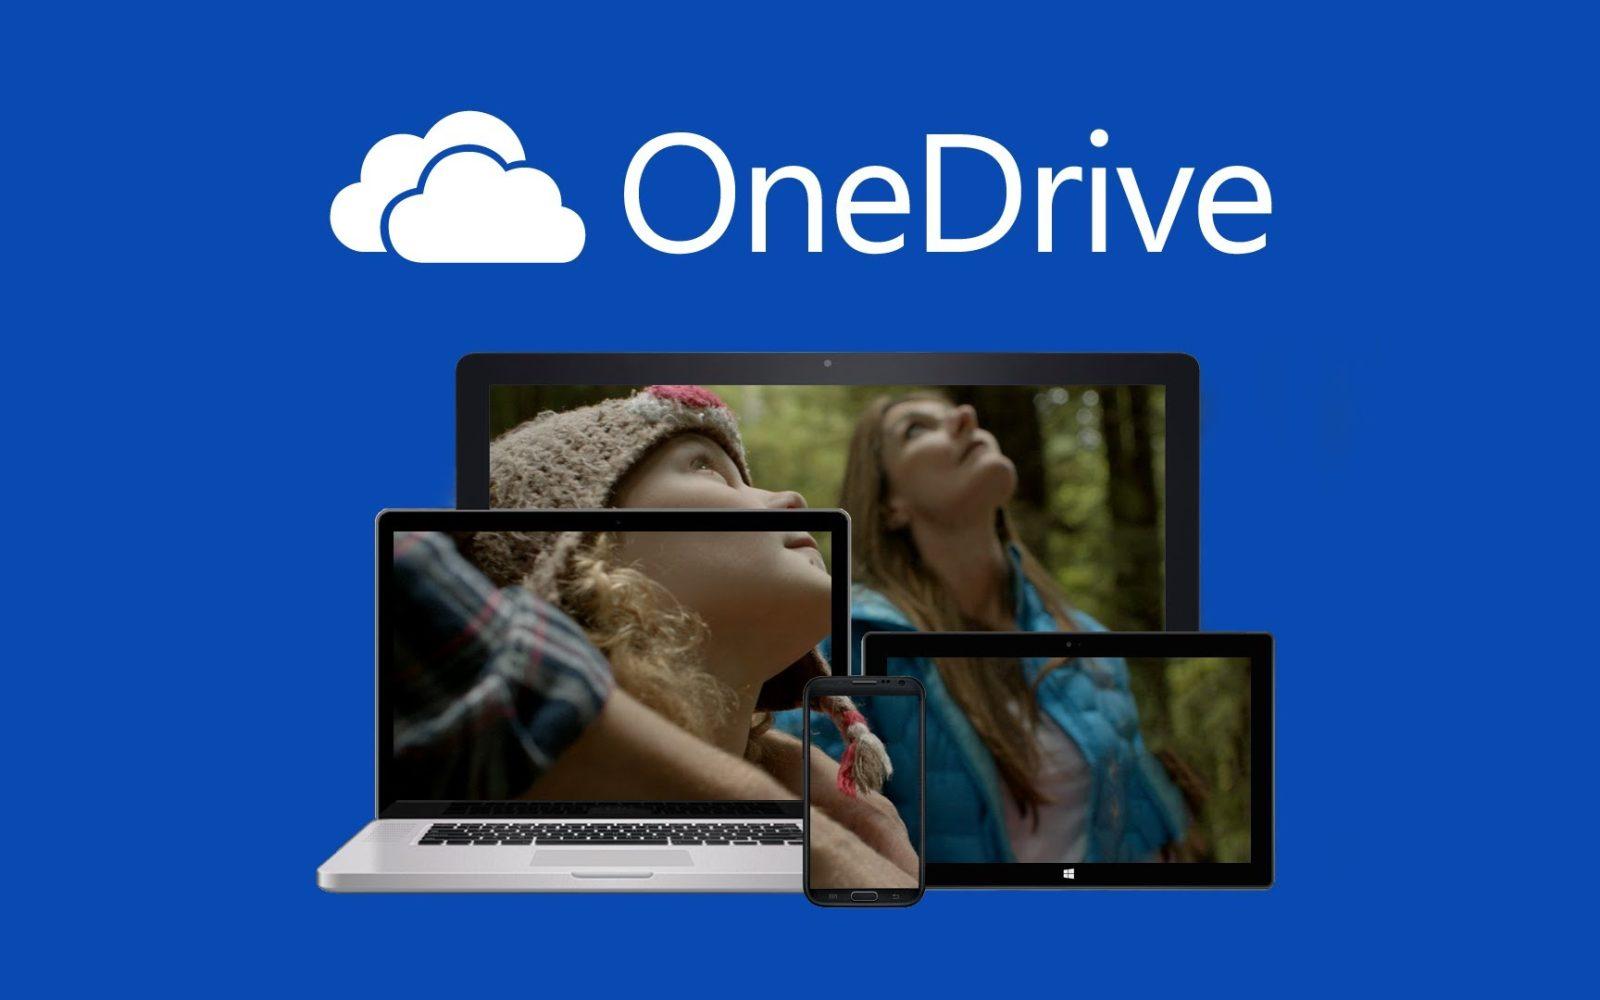 OneDrive - 9to5Mac